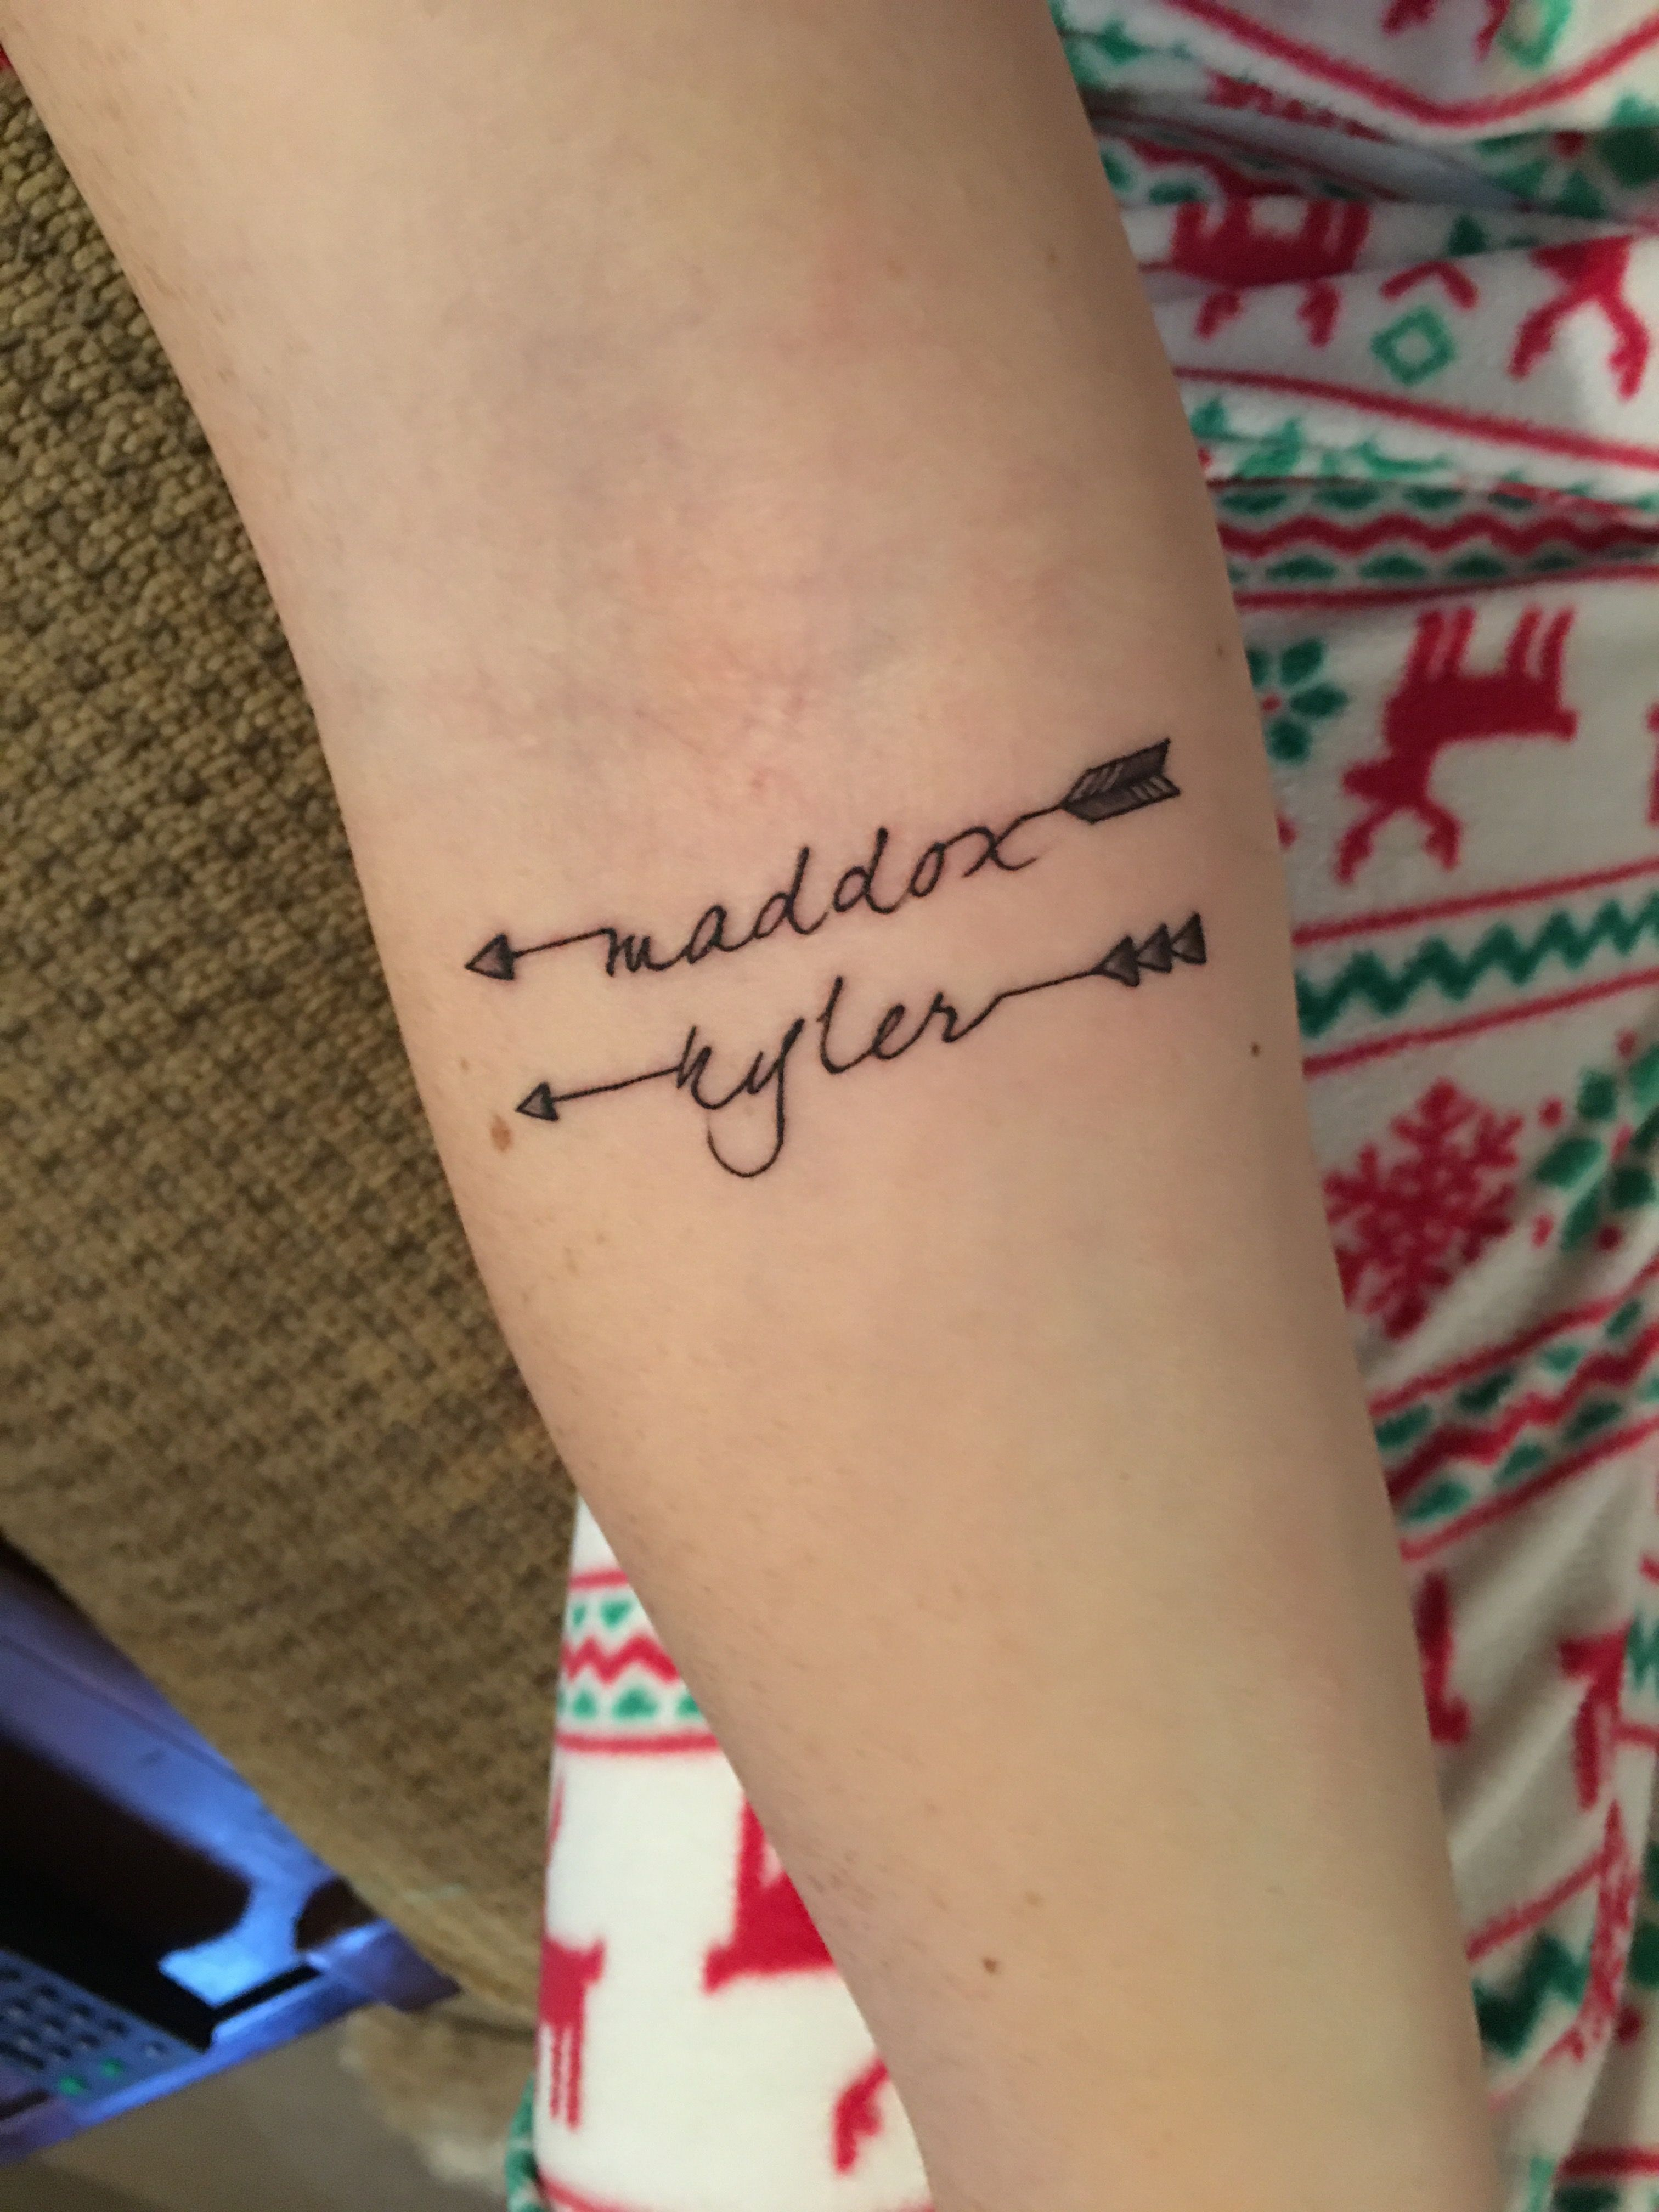 die zwej Söhne am Arm Tattoos for kids, Tattoos with